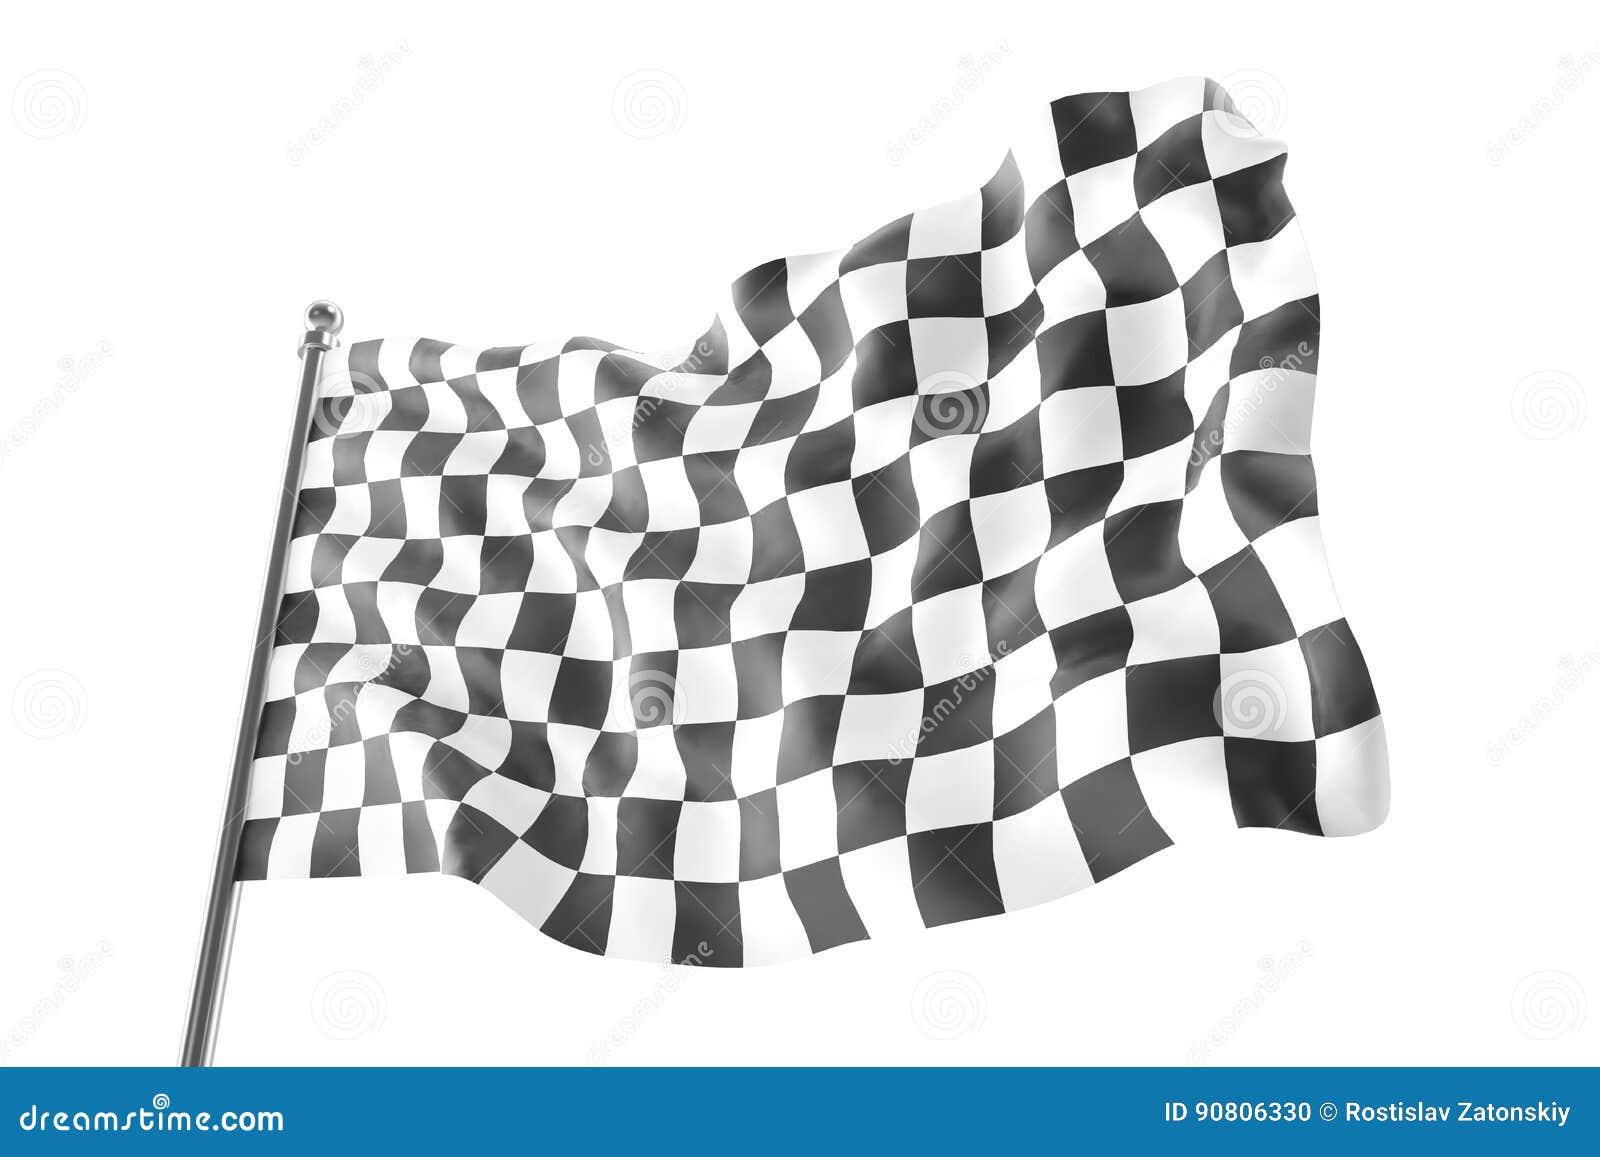 Checkered Race Flag  Finishing Checkered Flag, 3d Rendering